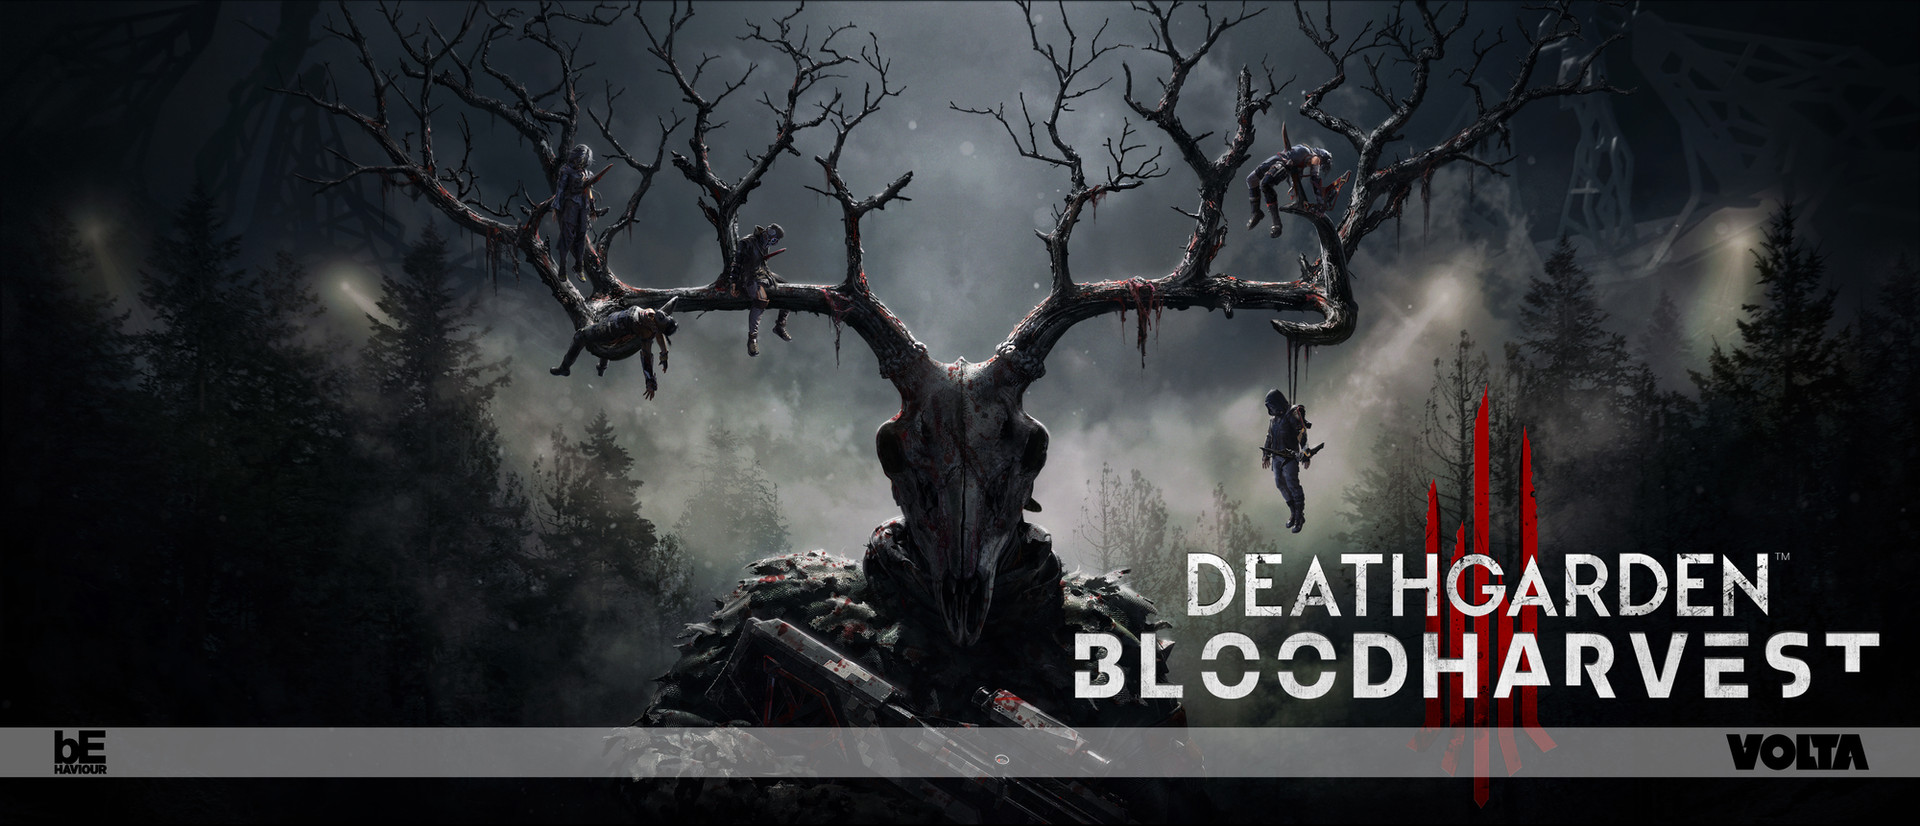 Deathgarden - KeyArt